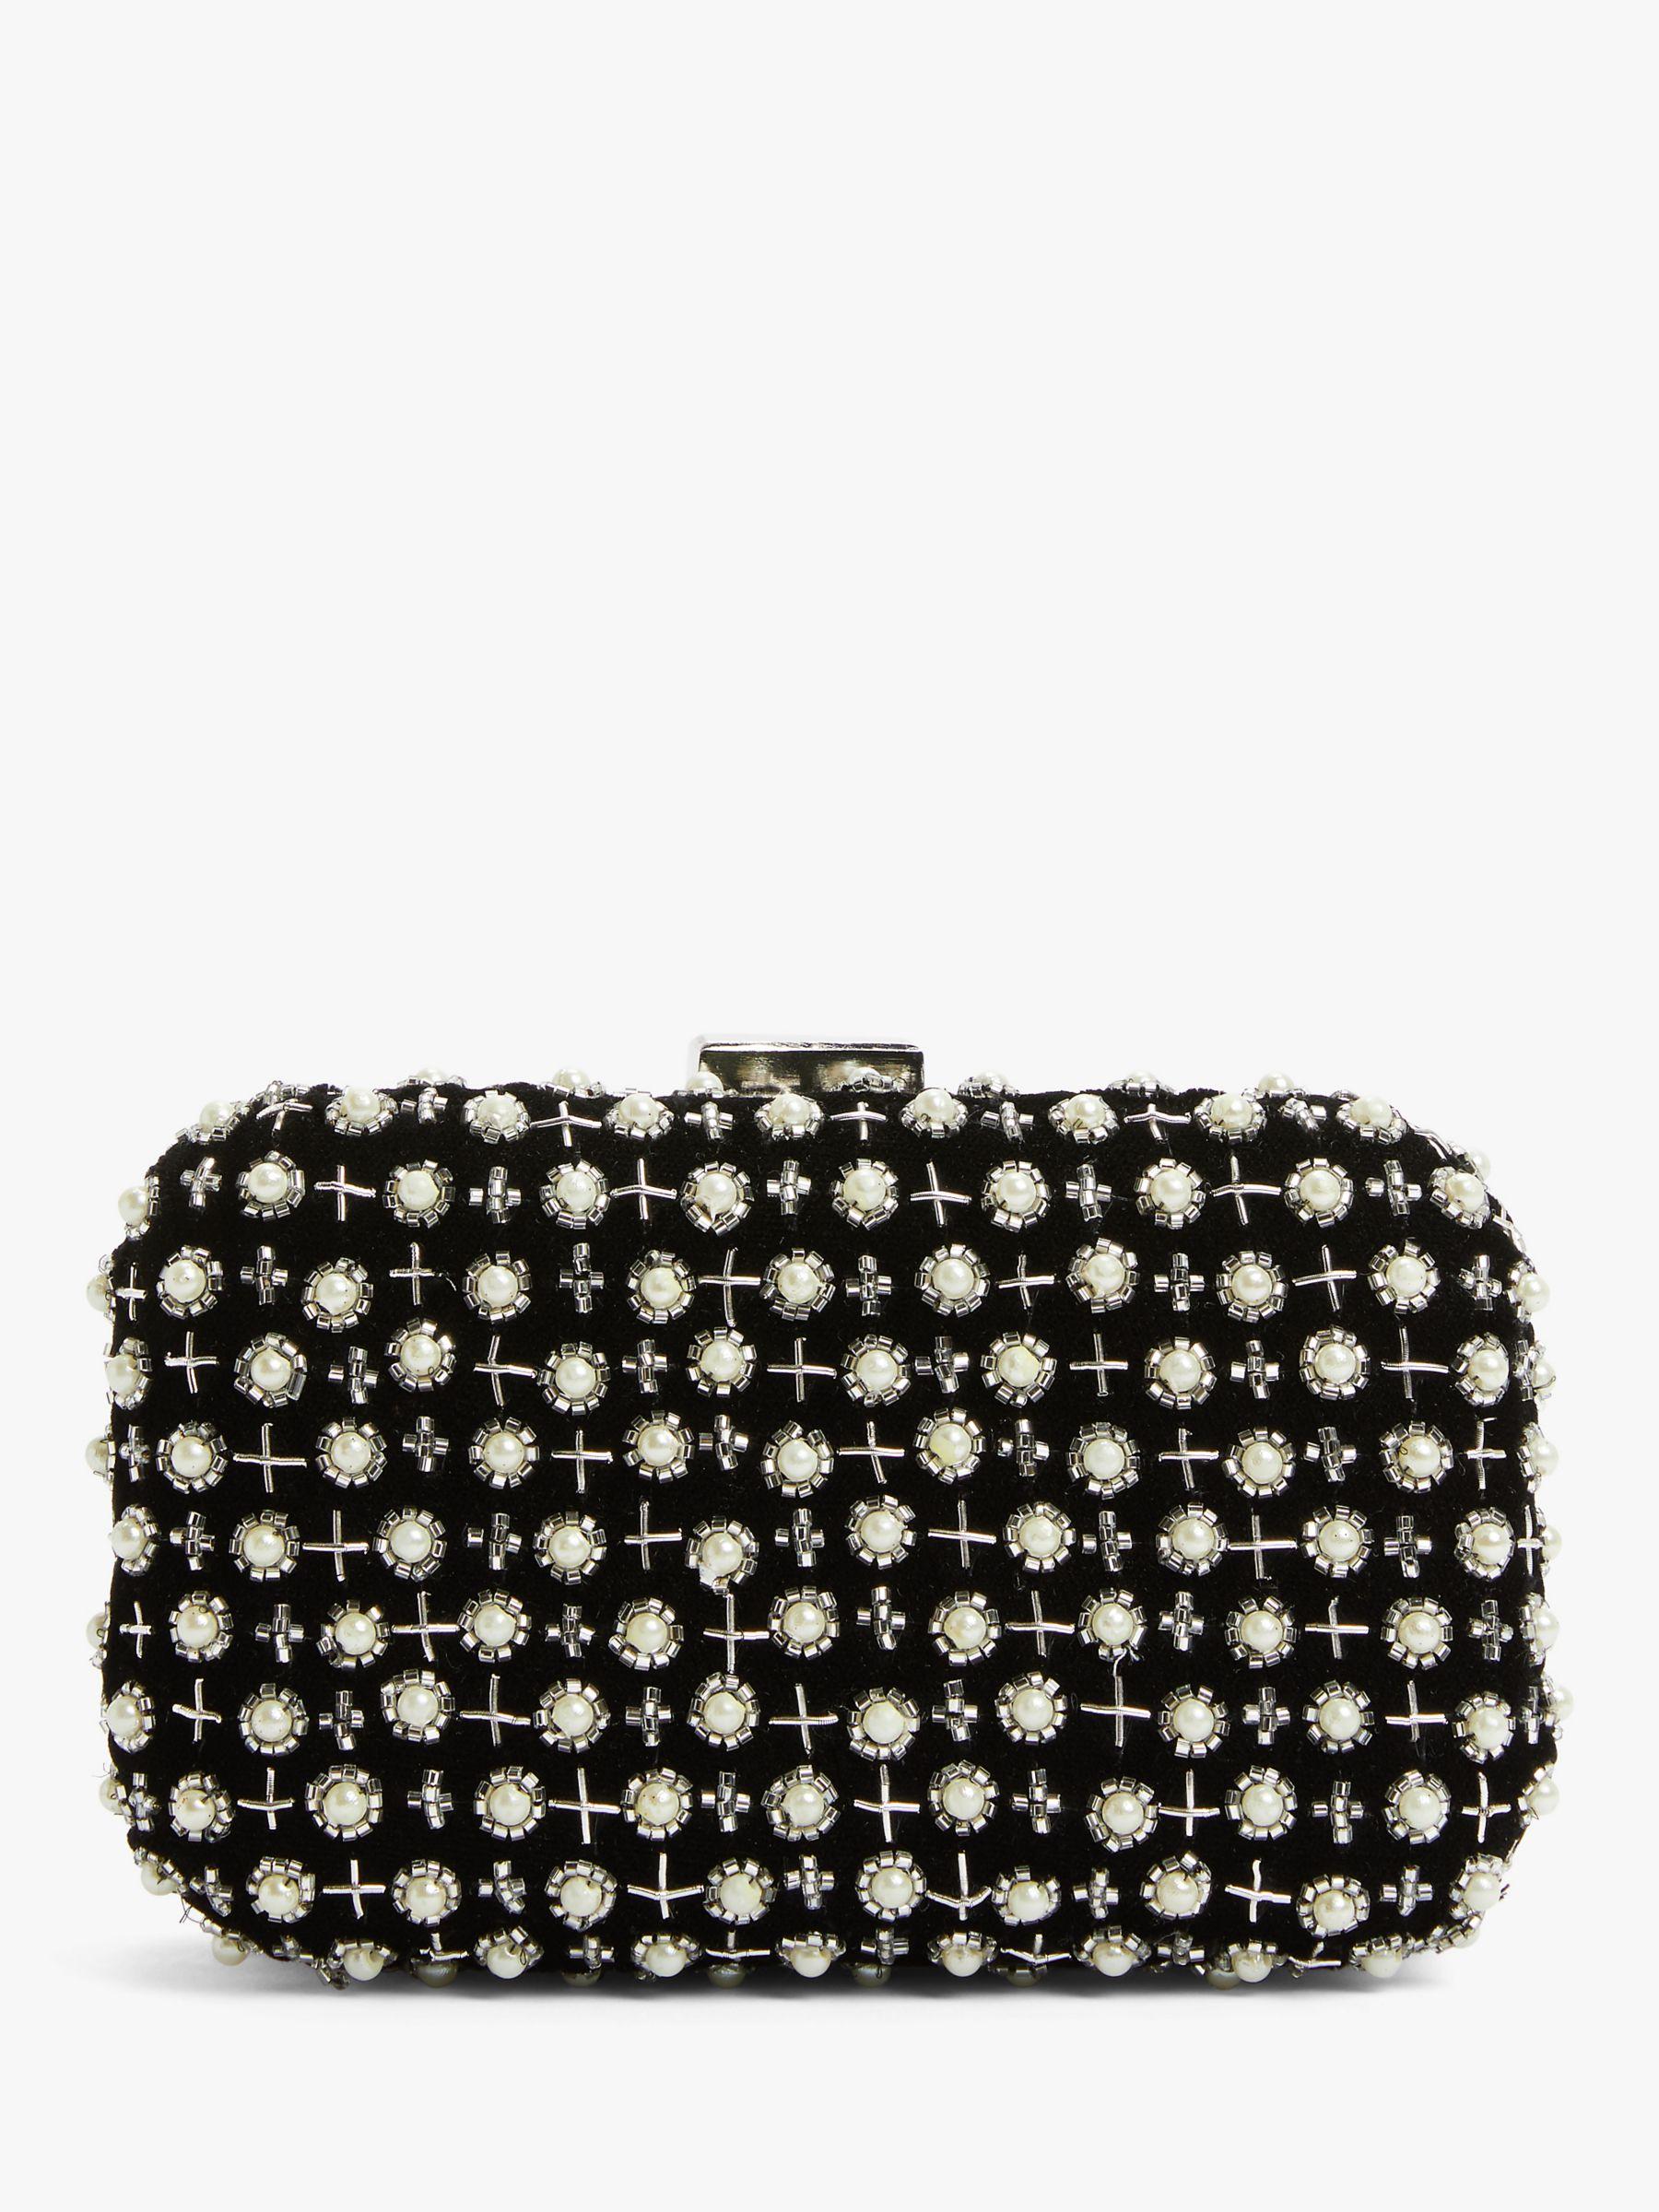 Becksondergaard Becksondergaard Violet Box Bag, Black